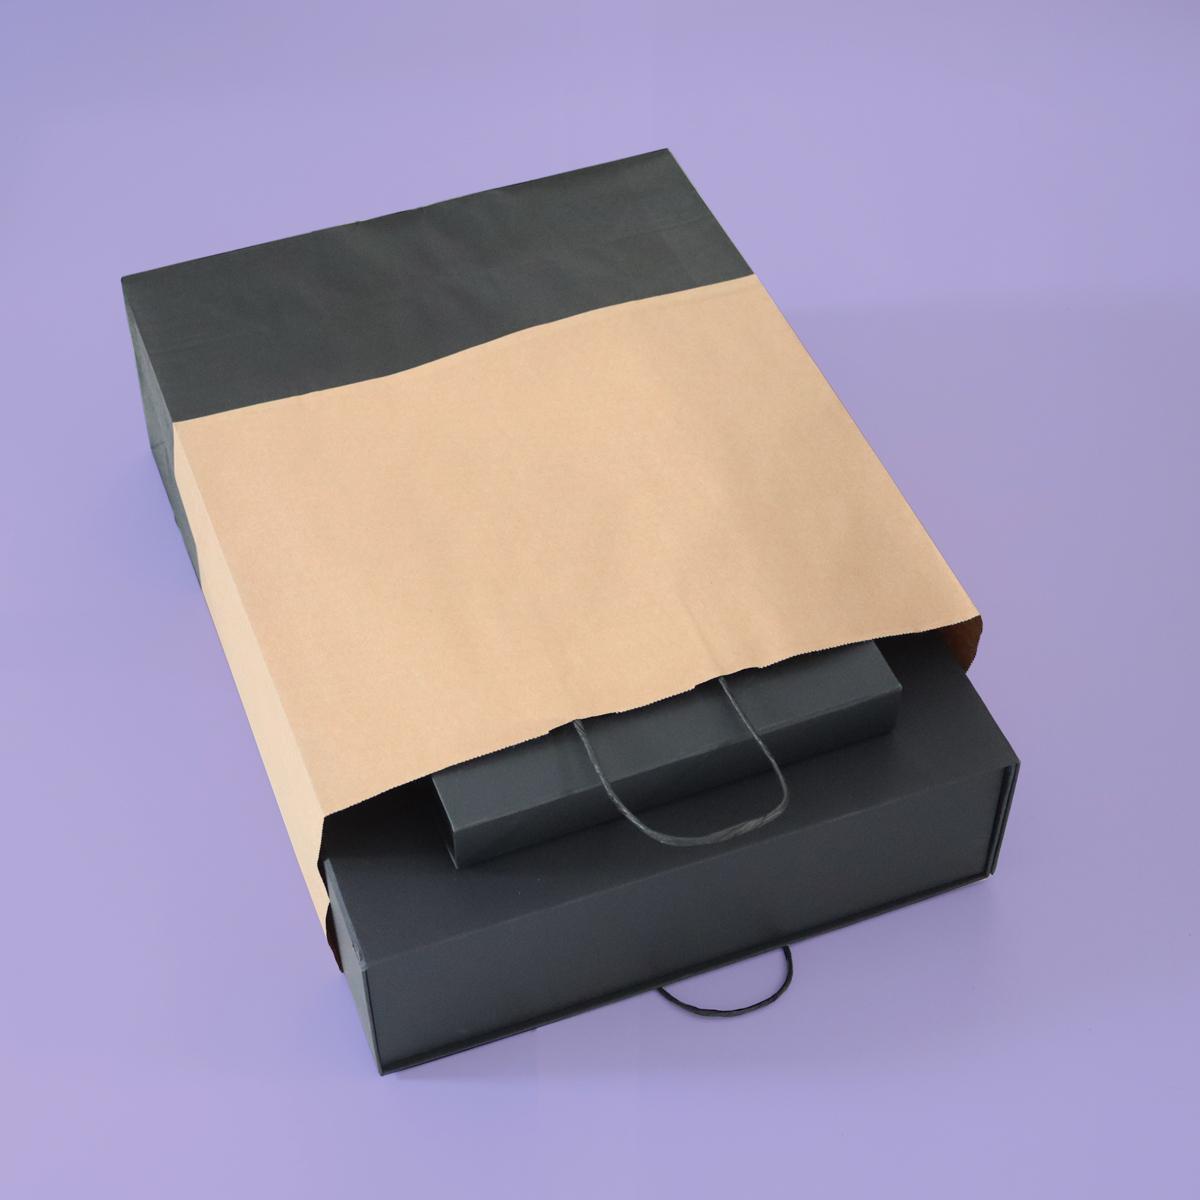 Twisted papieren tassen - Bruin/zwart duotone